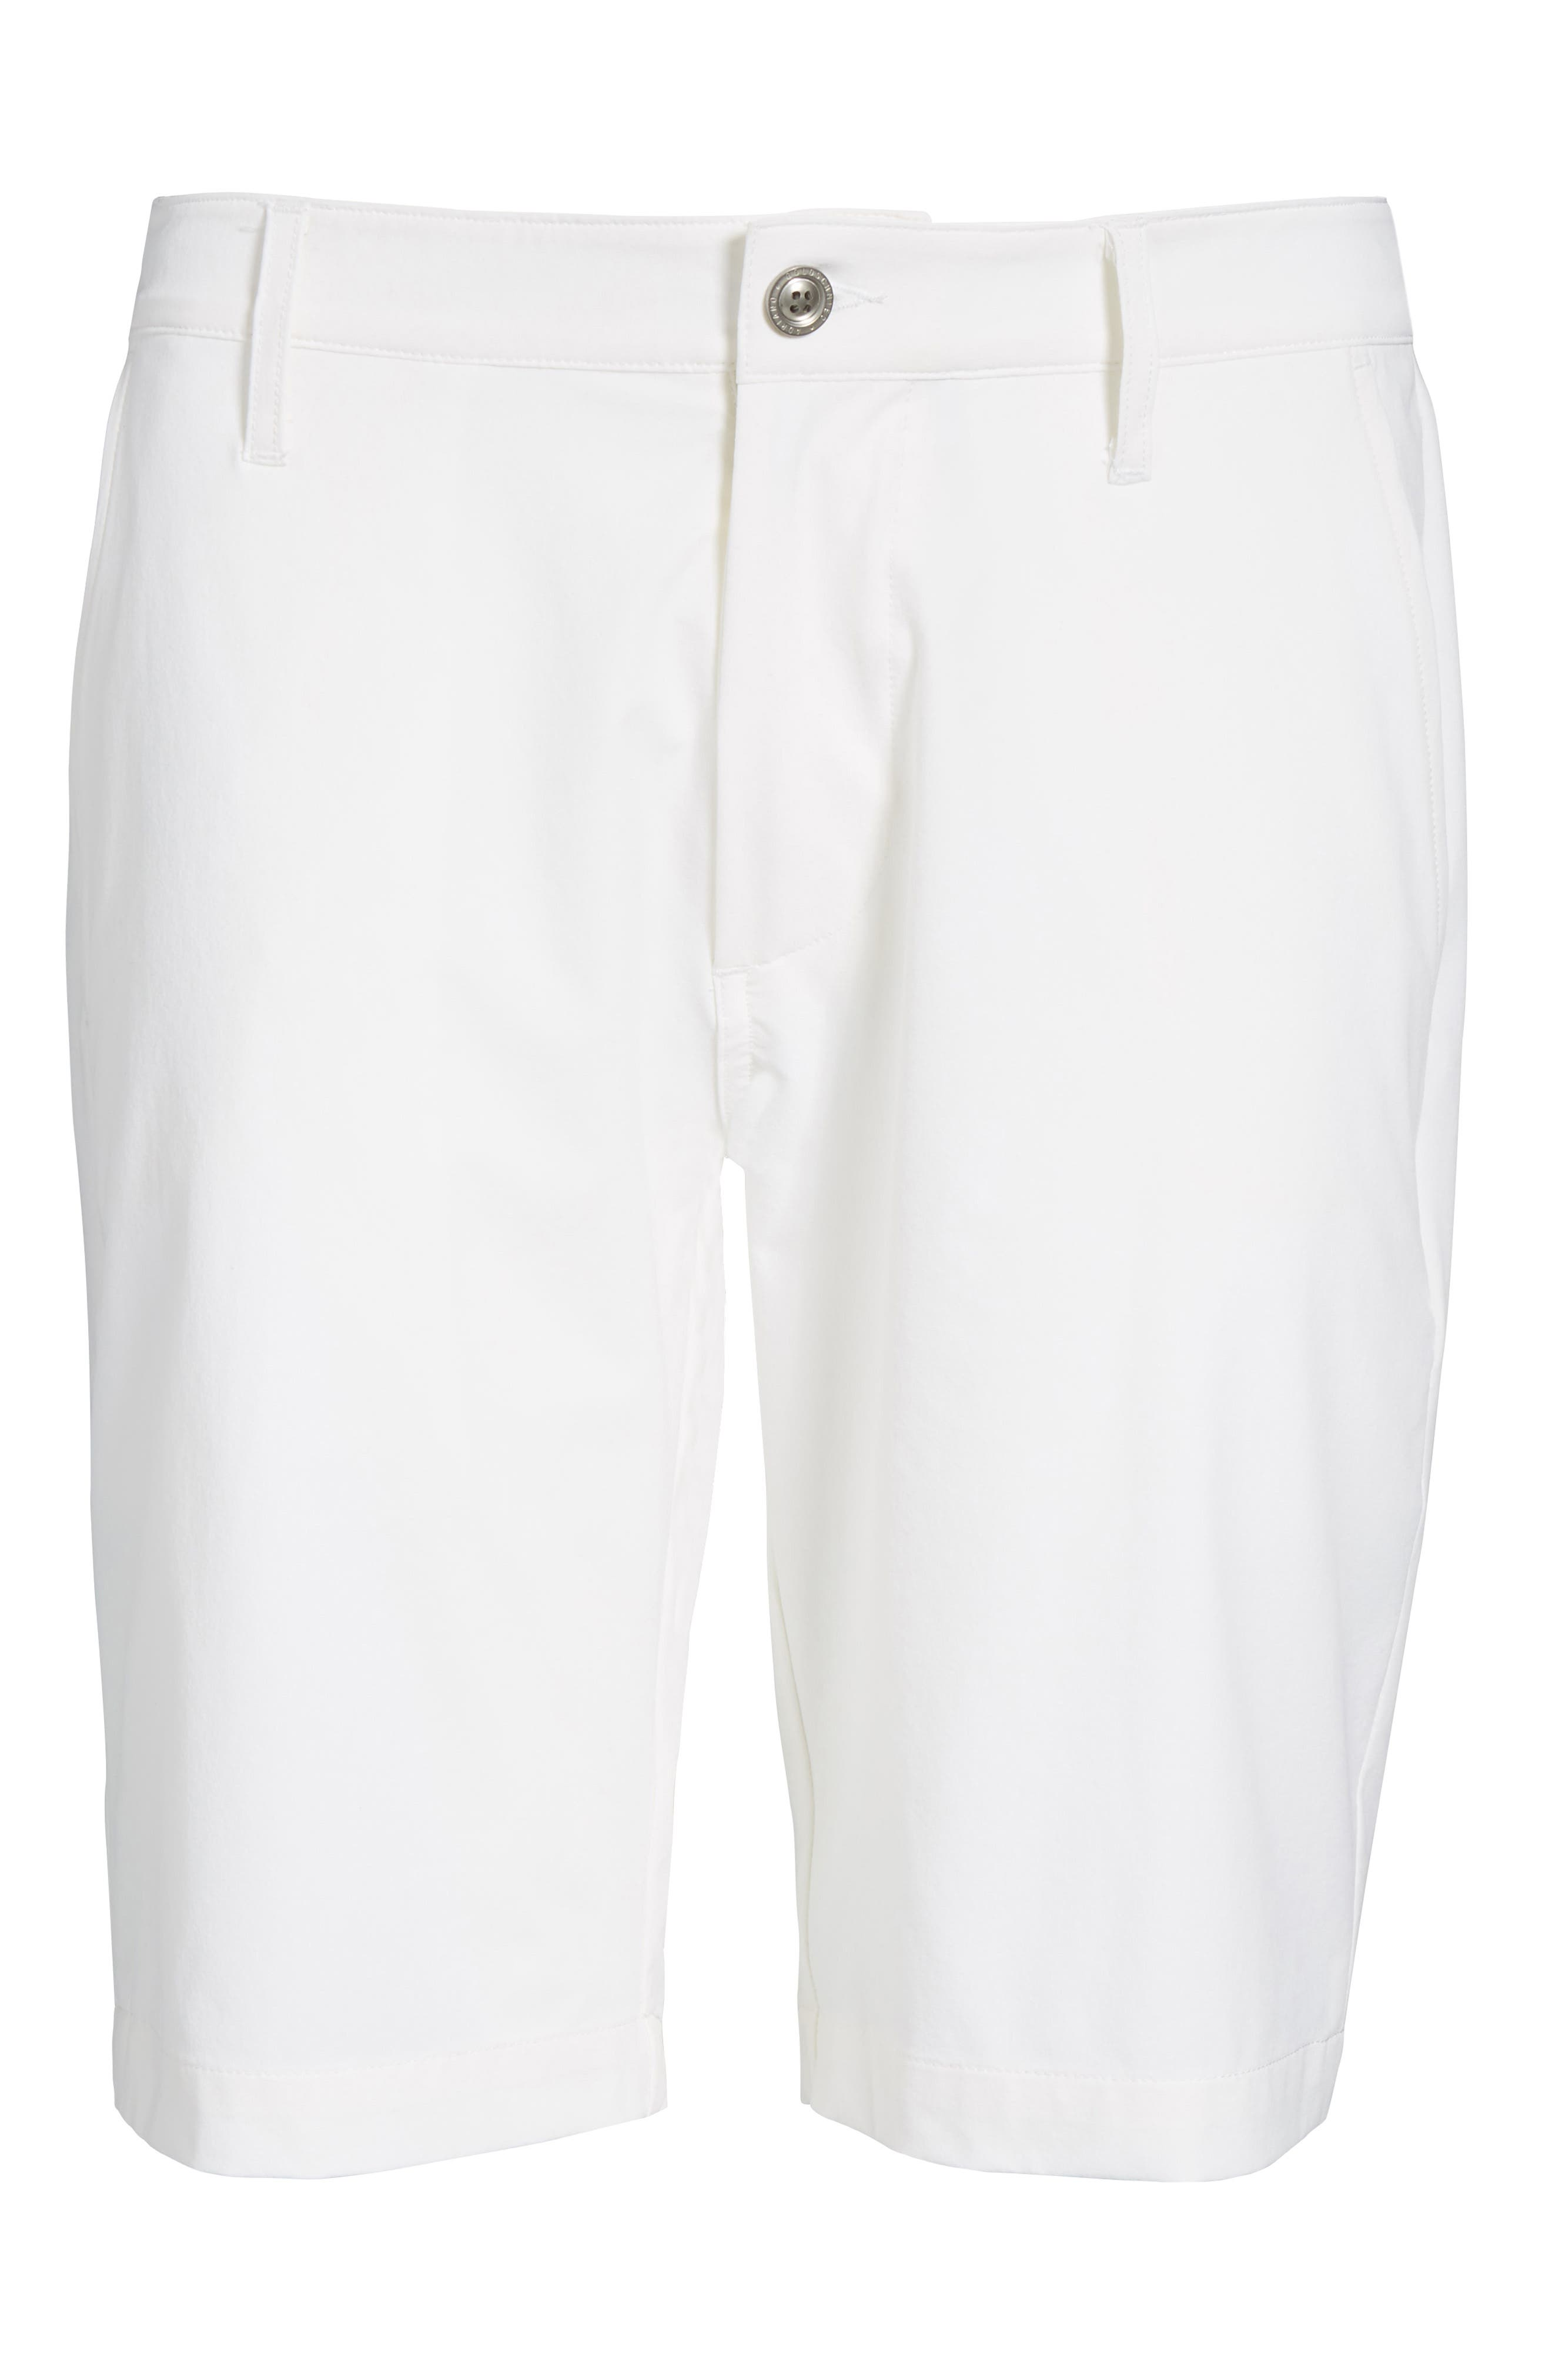 Canyon Shorts,                             Alternate thumbnail 6, color,                             Bright White